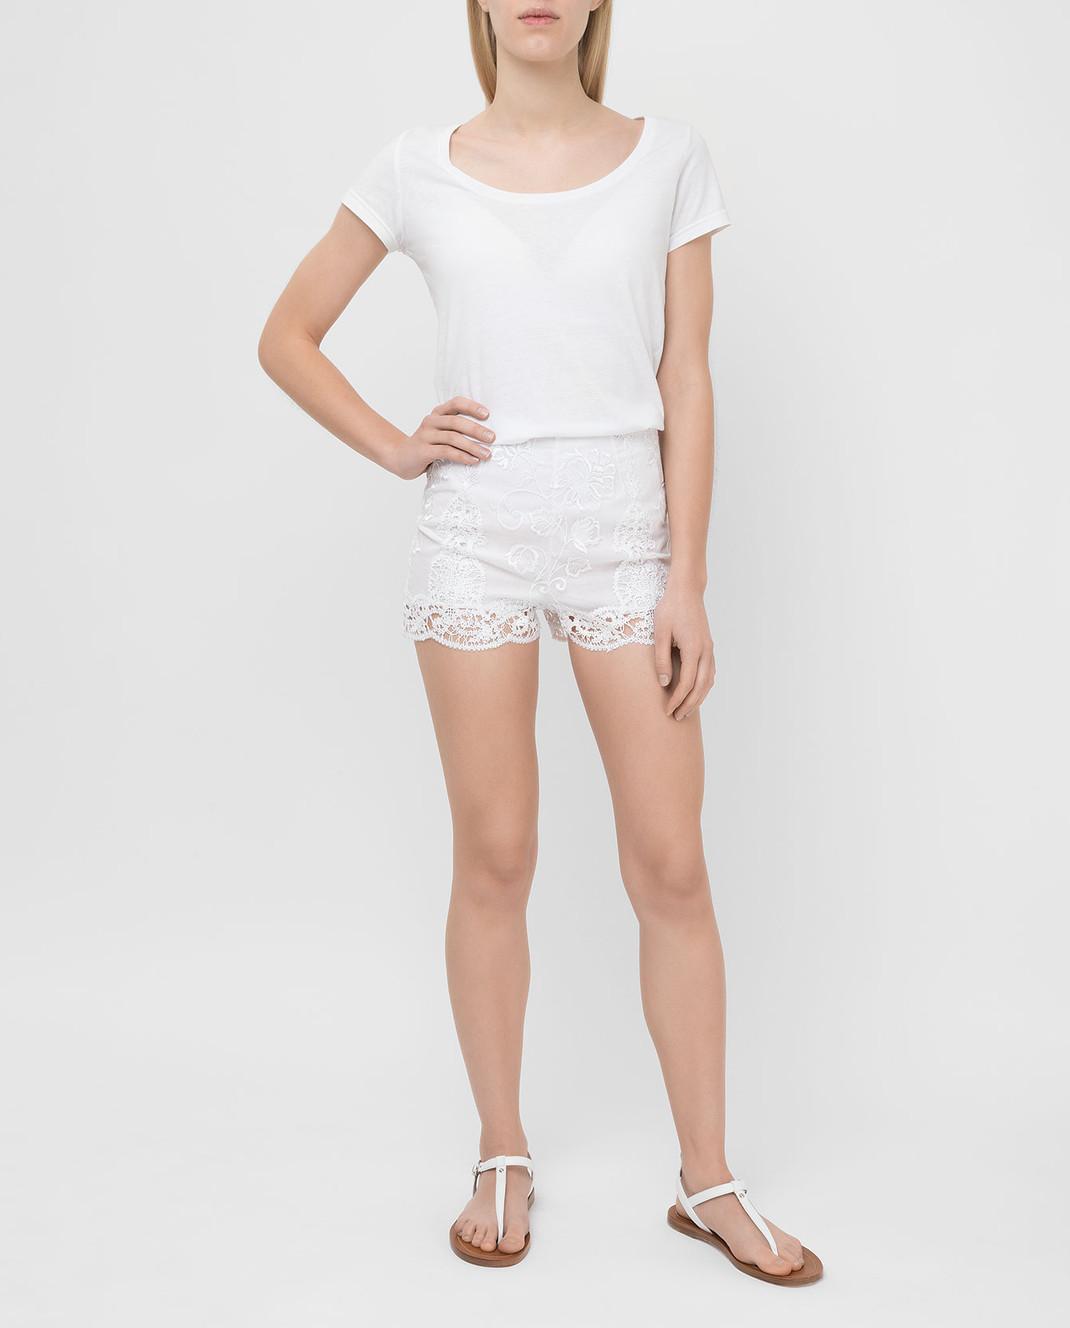 Charo Ruiz Белые шорты 00372 изображение 2